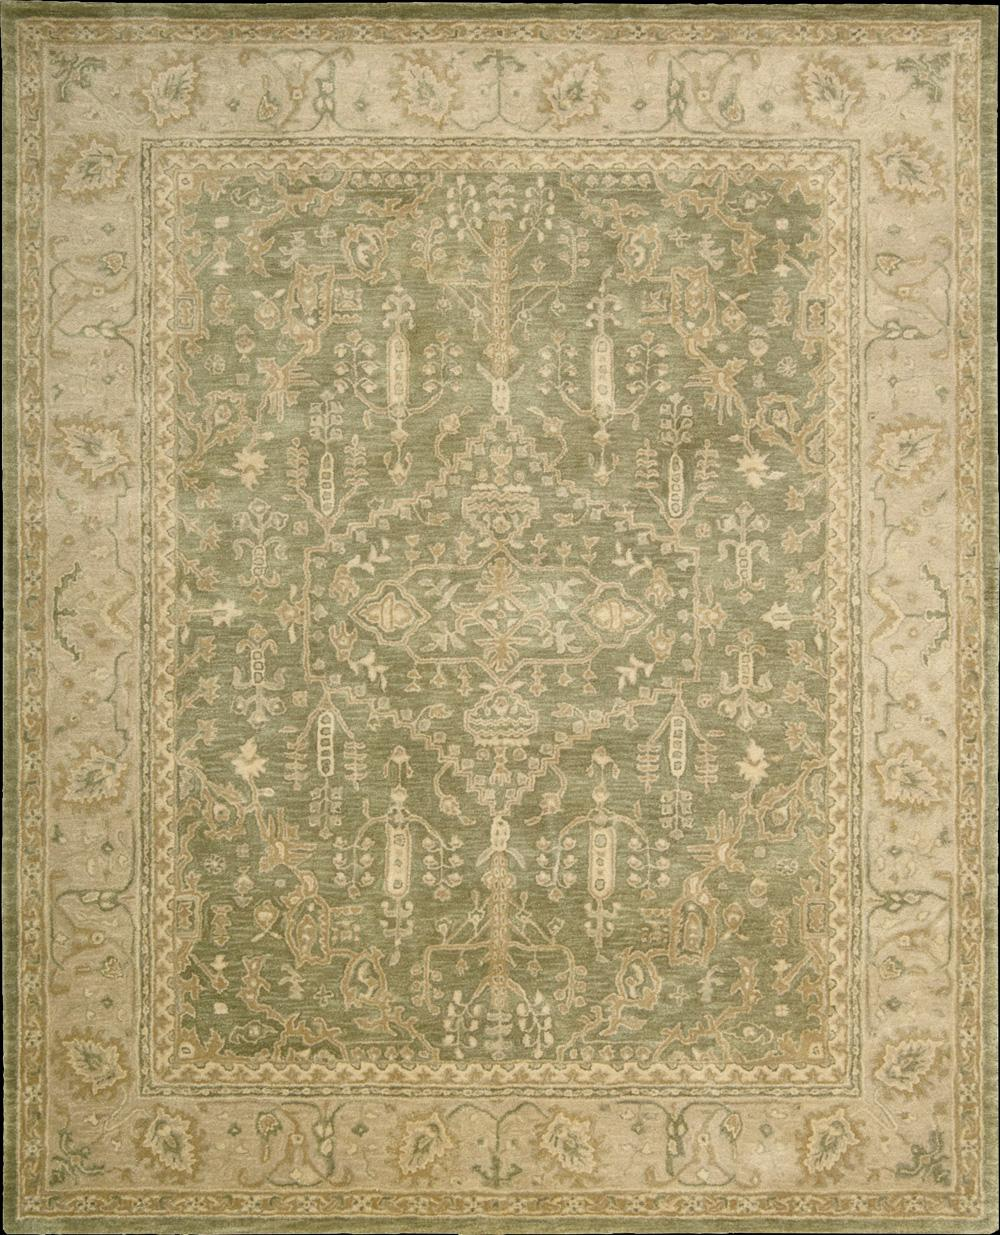 "Nourison Jaipur Area Rug 9'6"" x 13'6"" - Item Number: 11647"